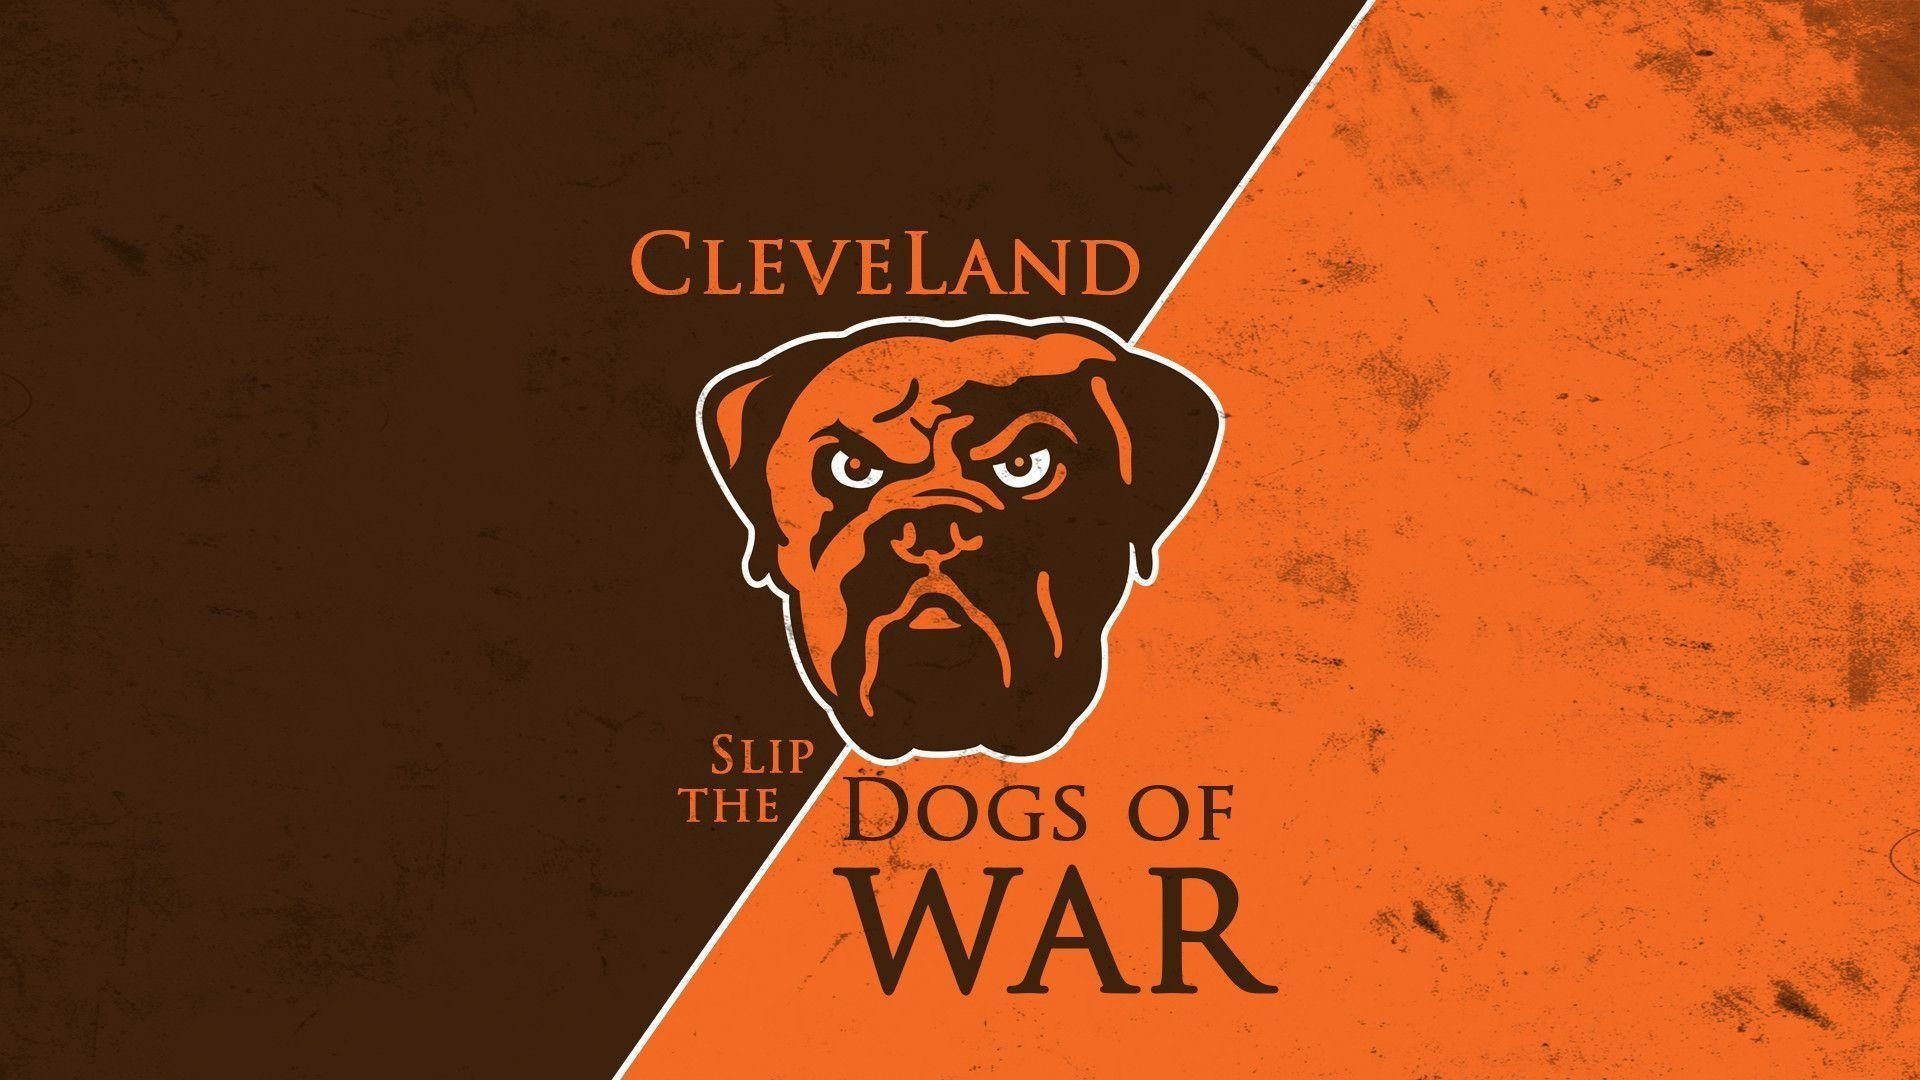 NFL Team Logo Cleveland Browns wallpaper HD 2016 in Football .